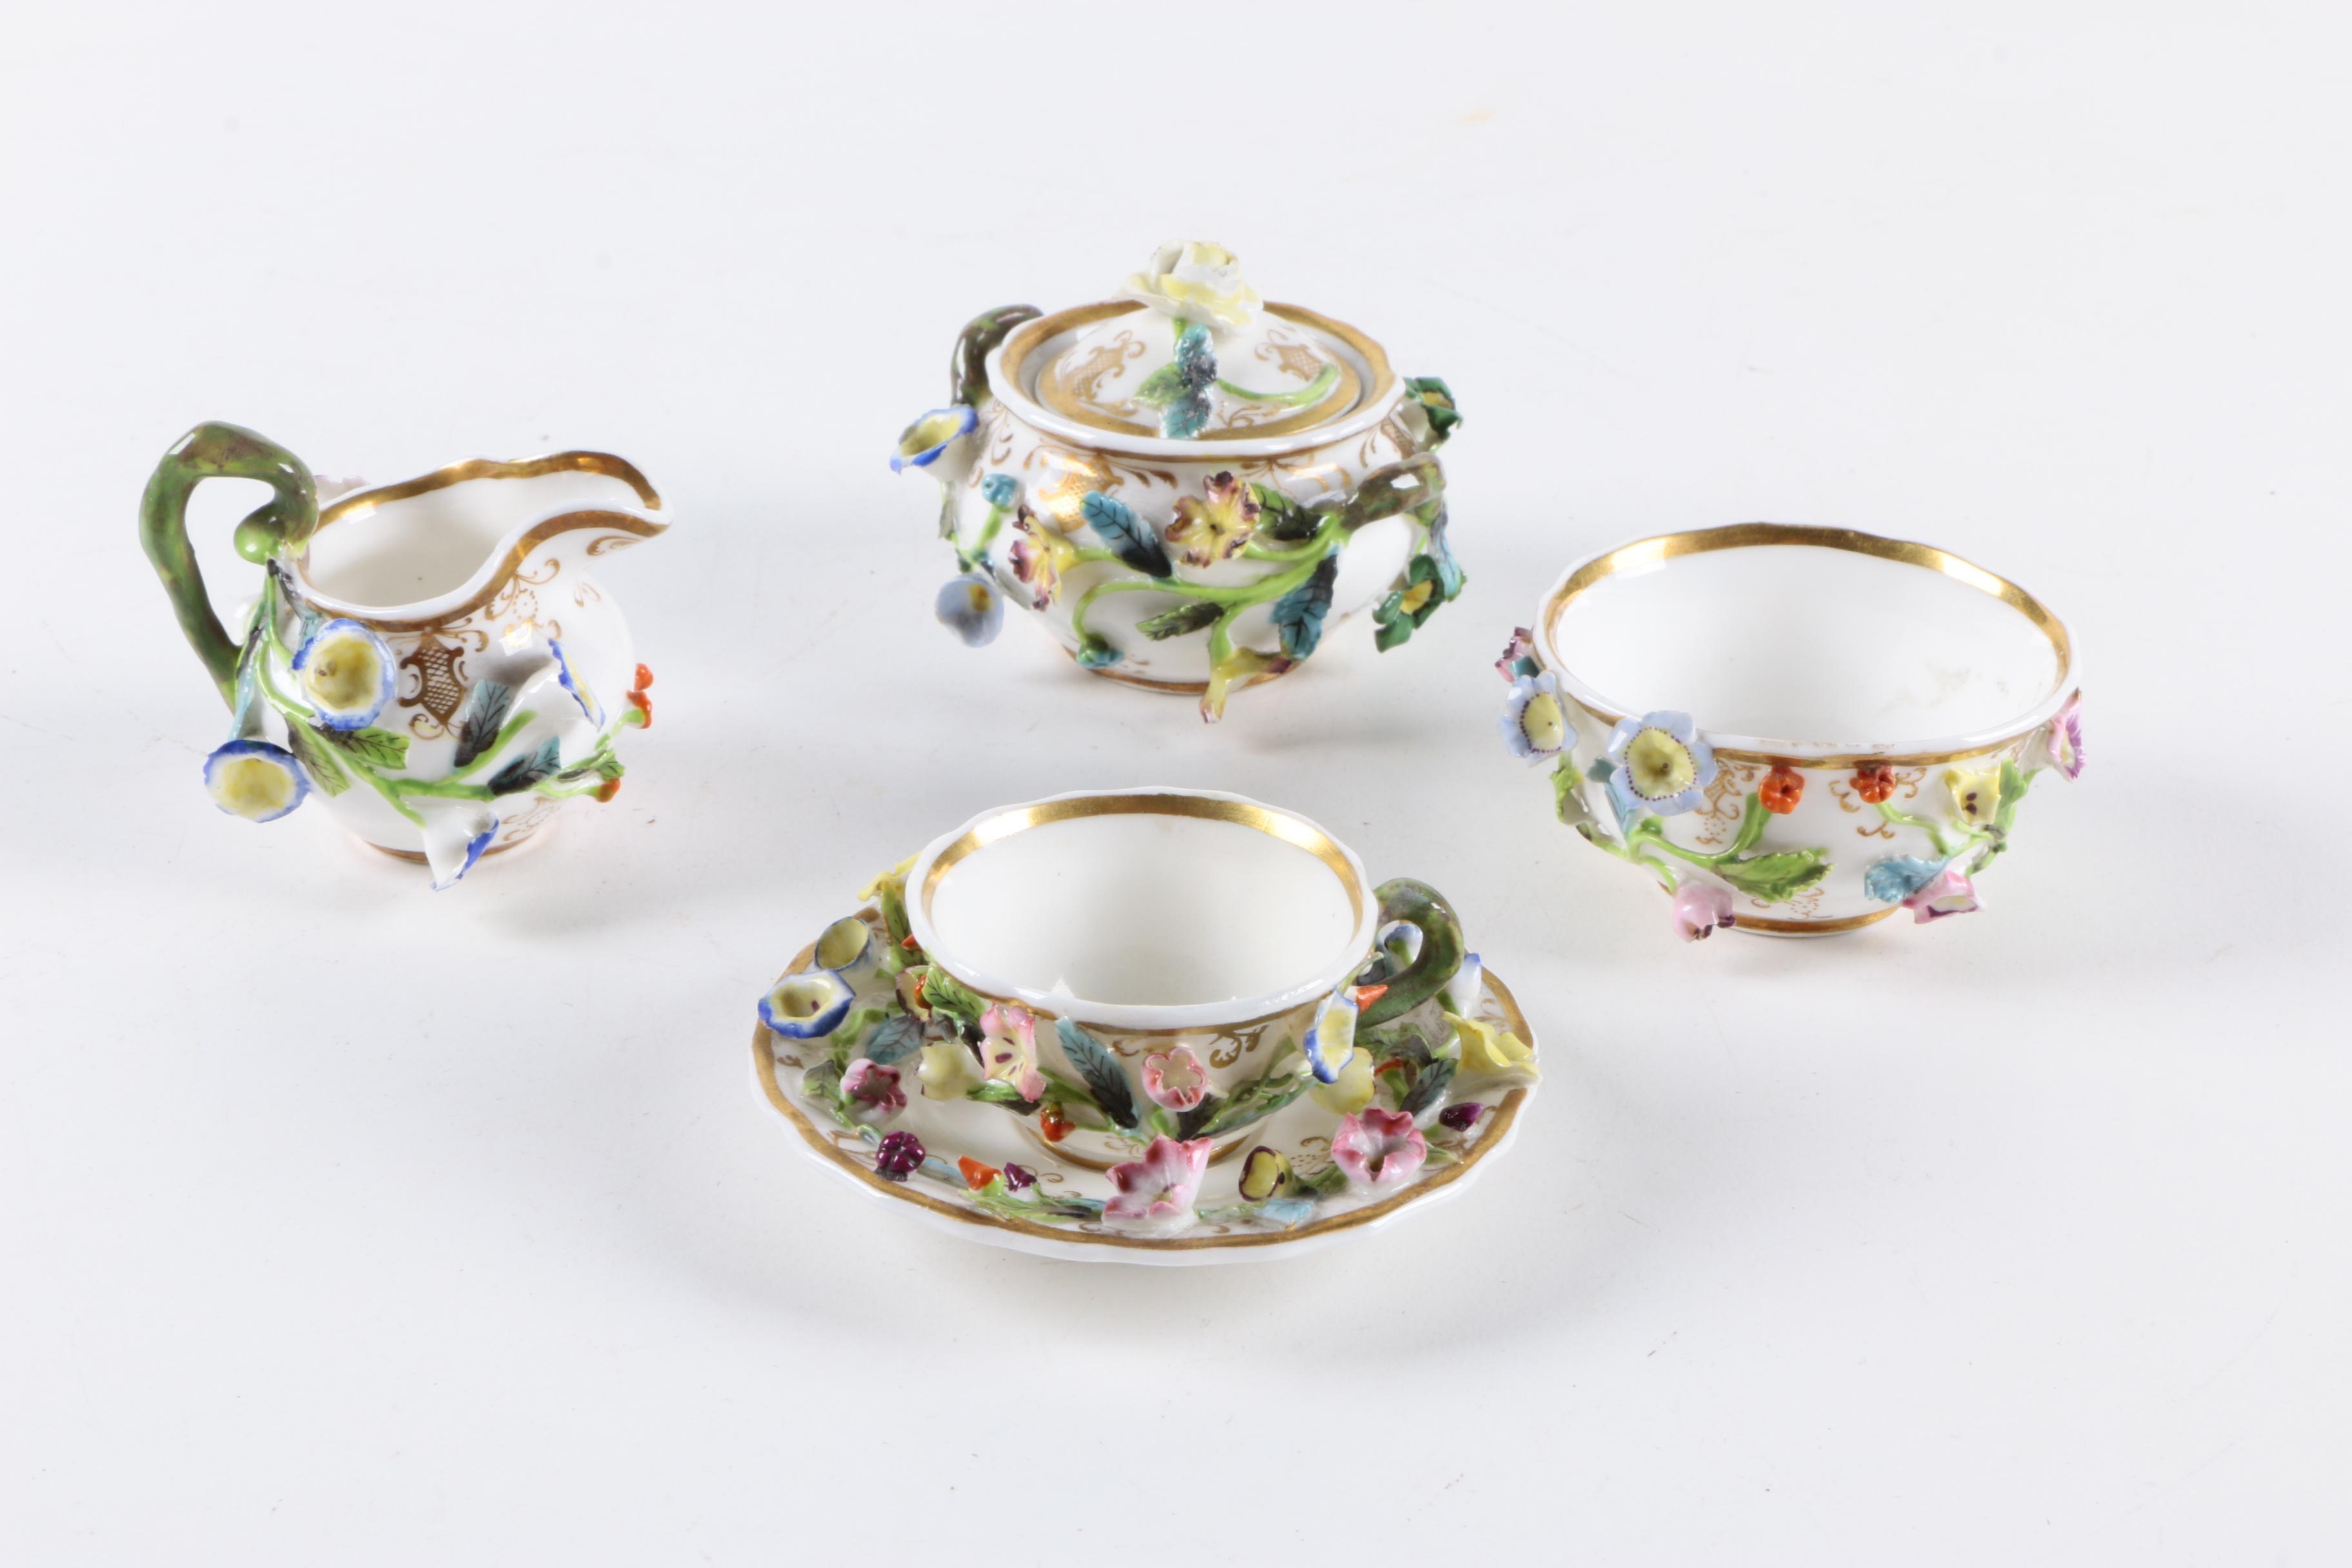 1830 Spode Miniature Porcelain Tea Set